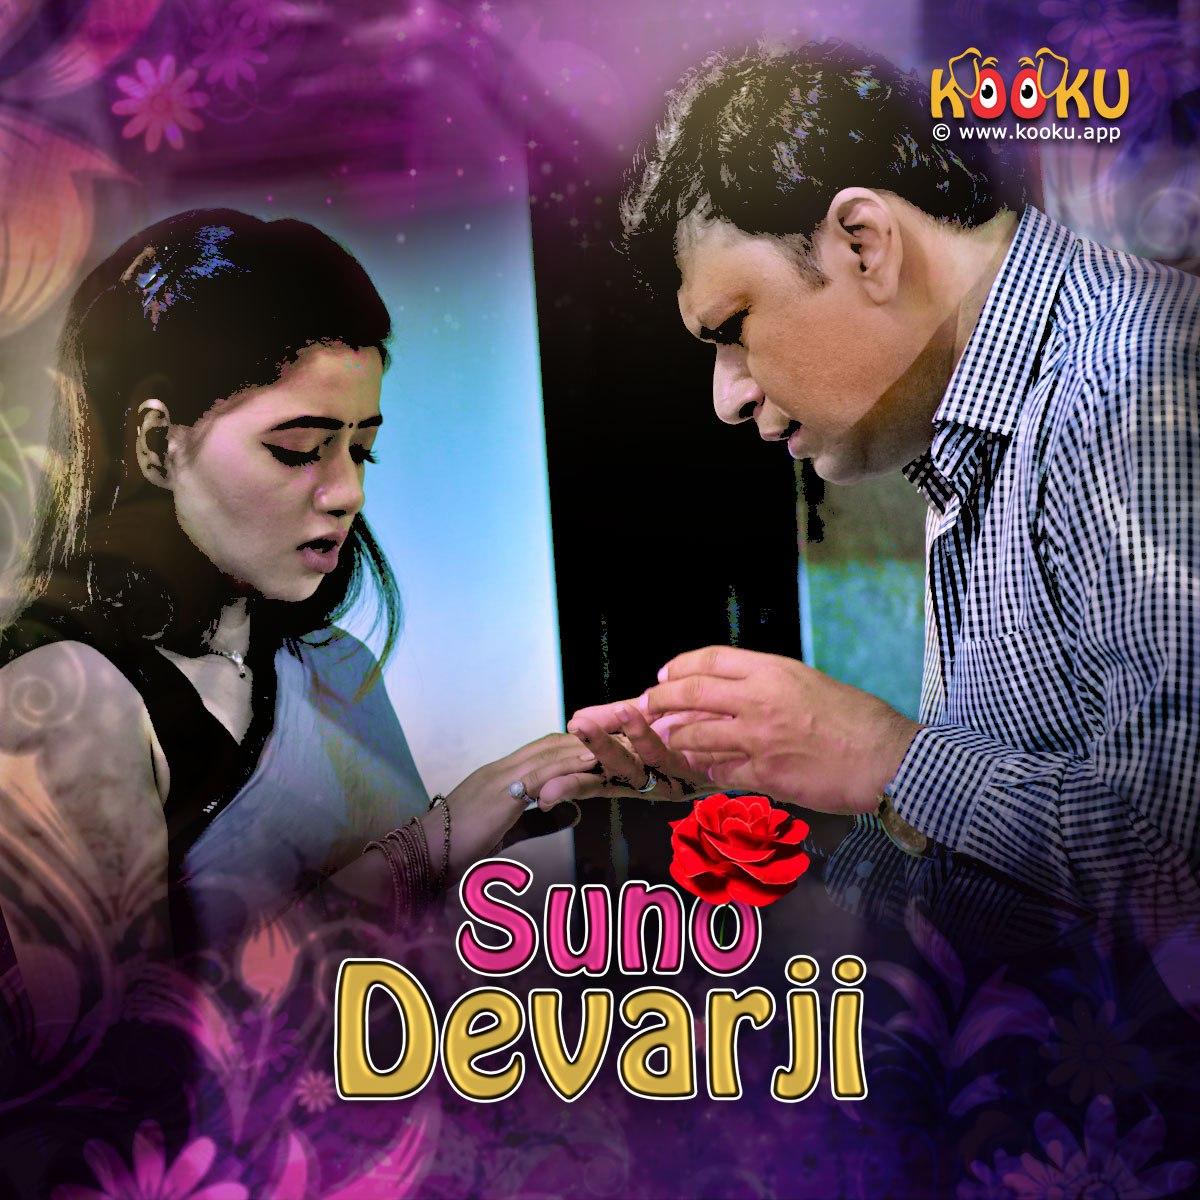 Suno Devarji 2020 Season 01 Hindi Kooku App Web Series Official Trailer 1080p HDRip 30MB Download